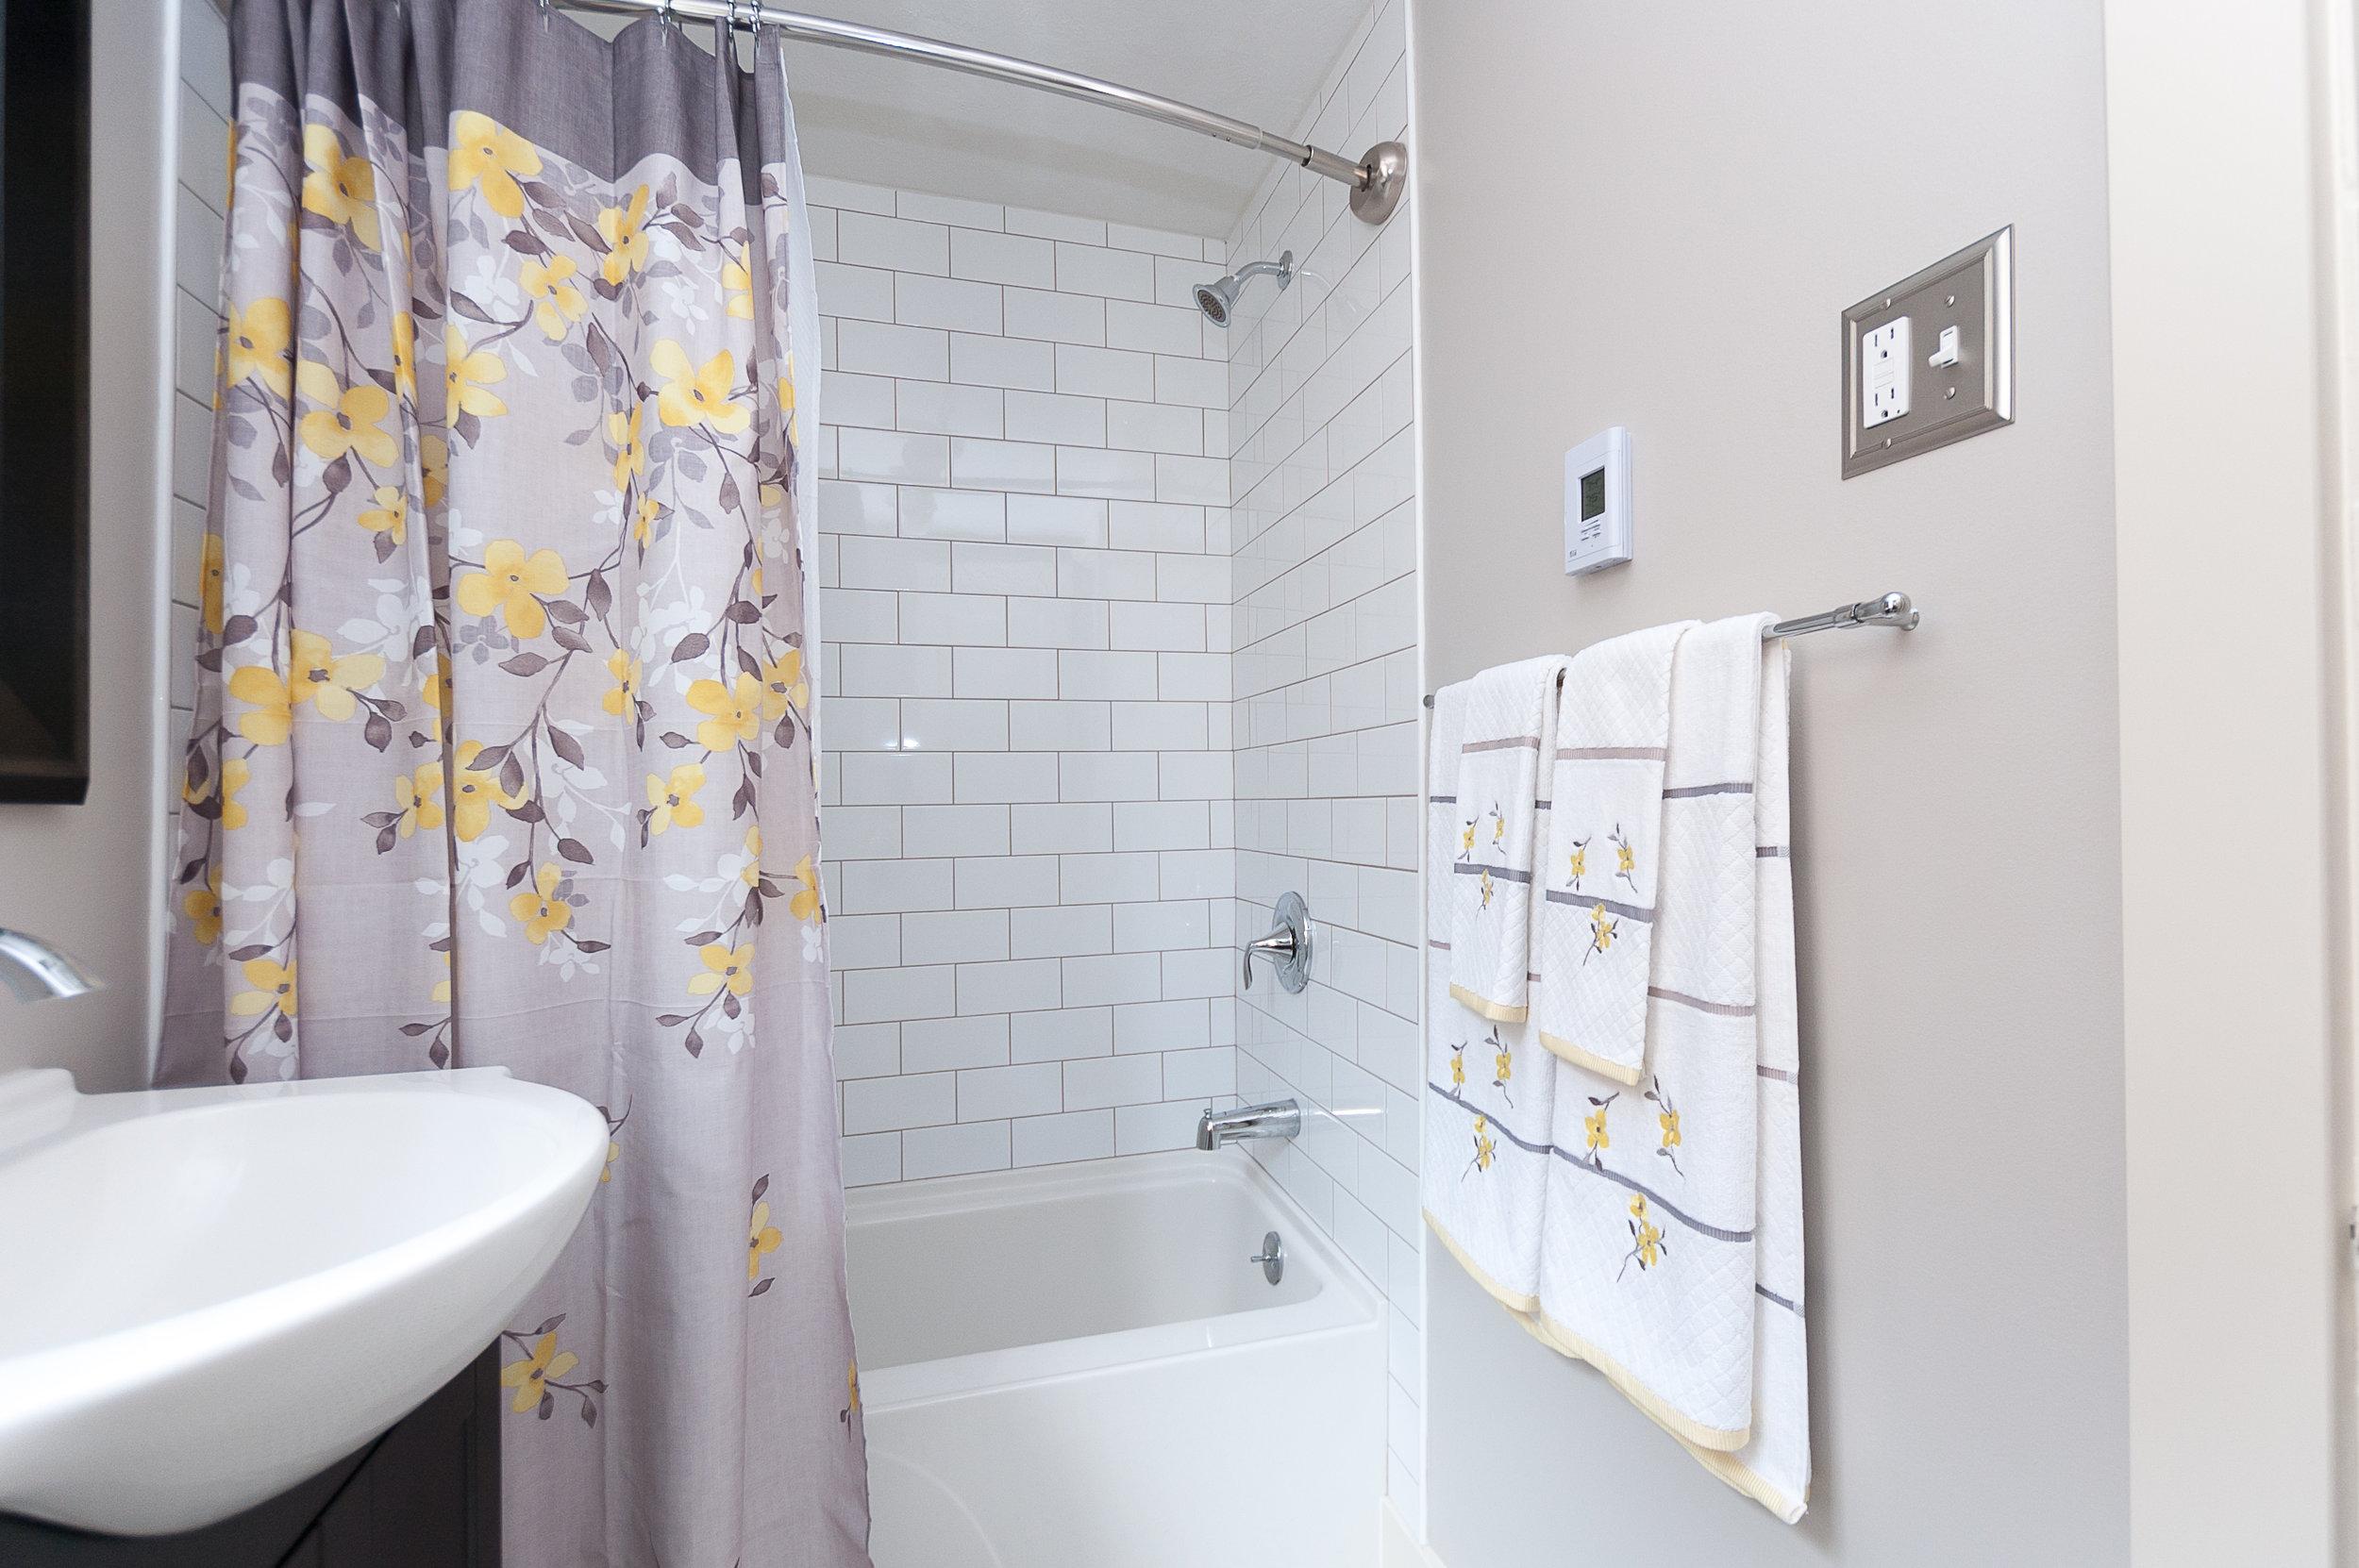 After - Shower faucet area.jpg